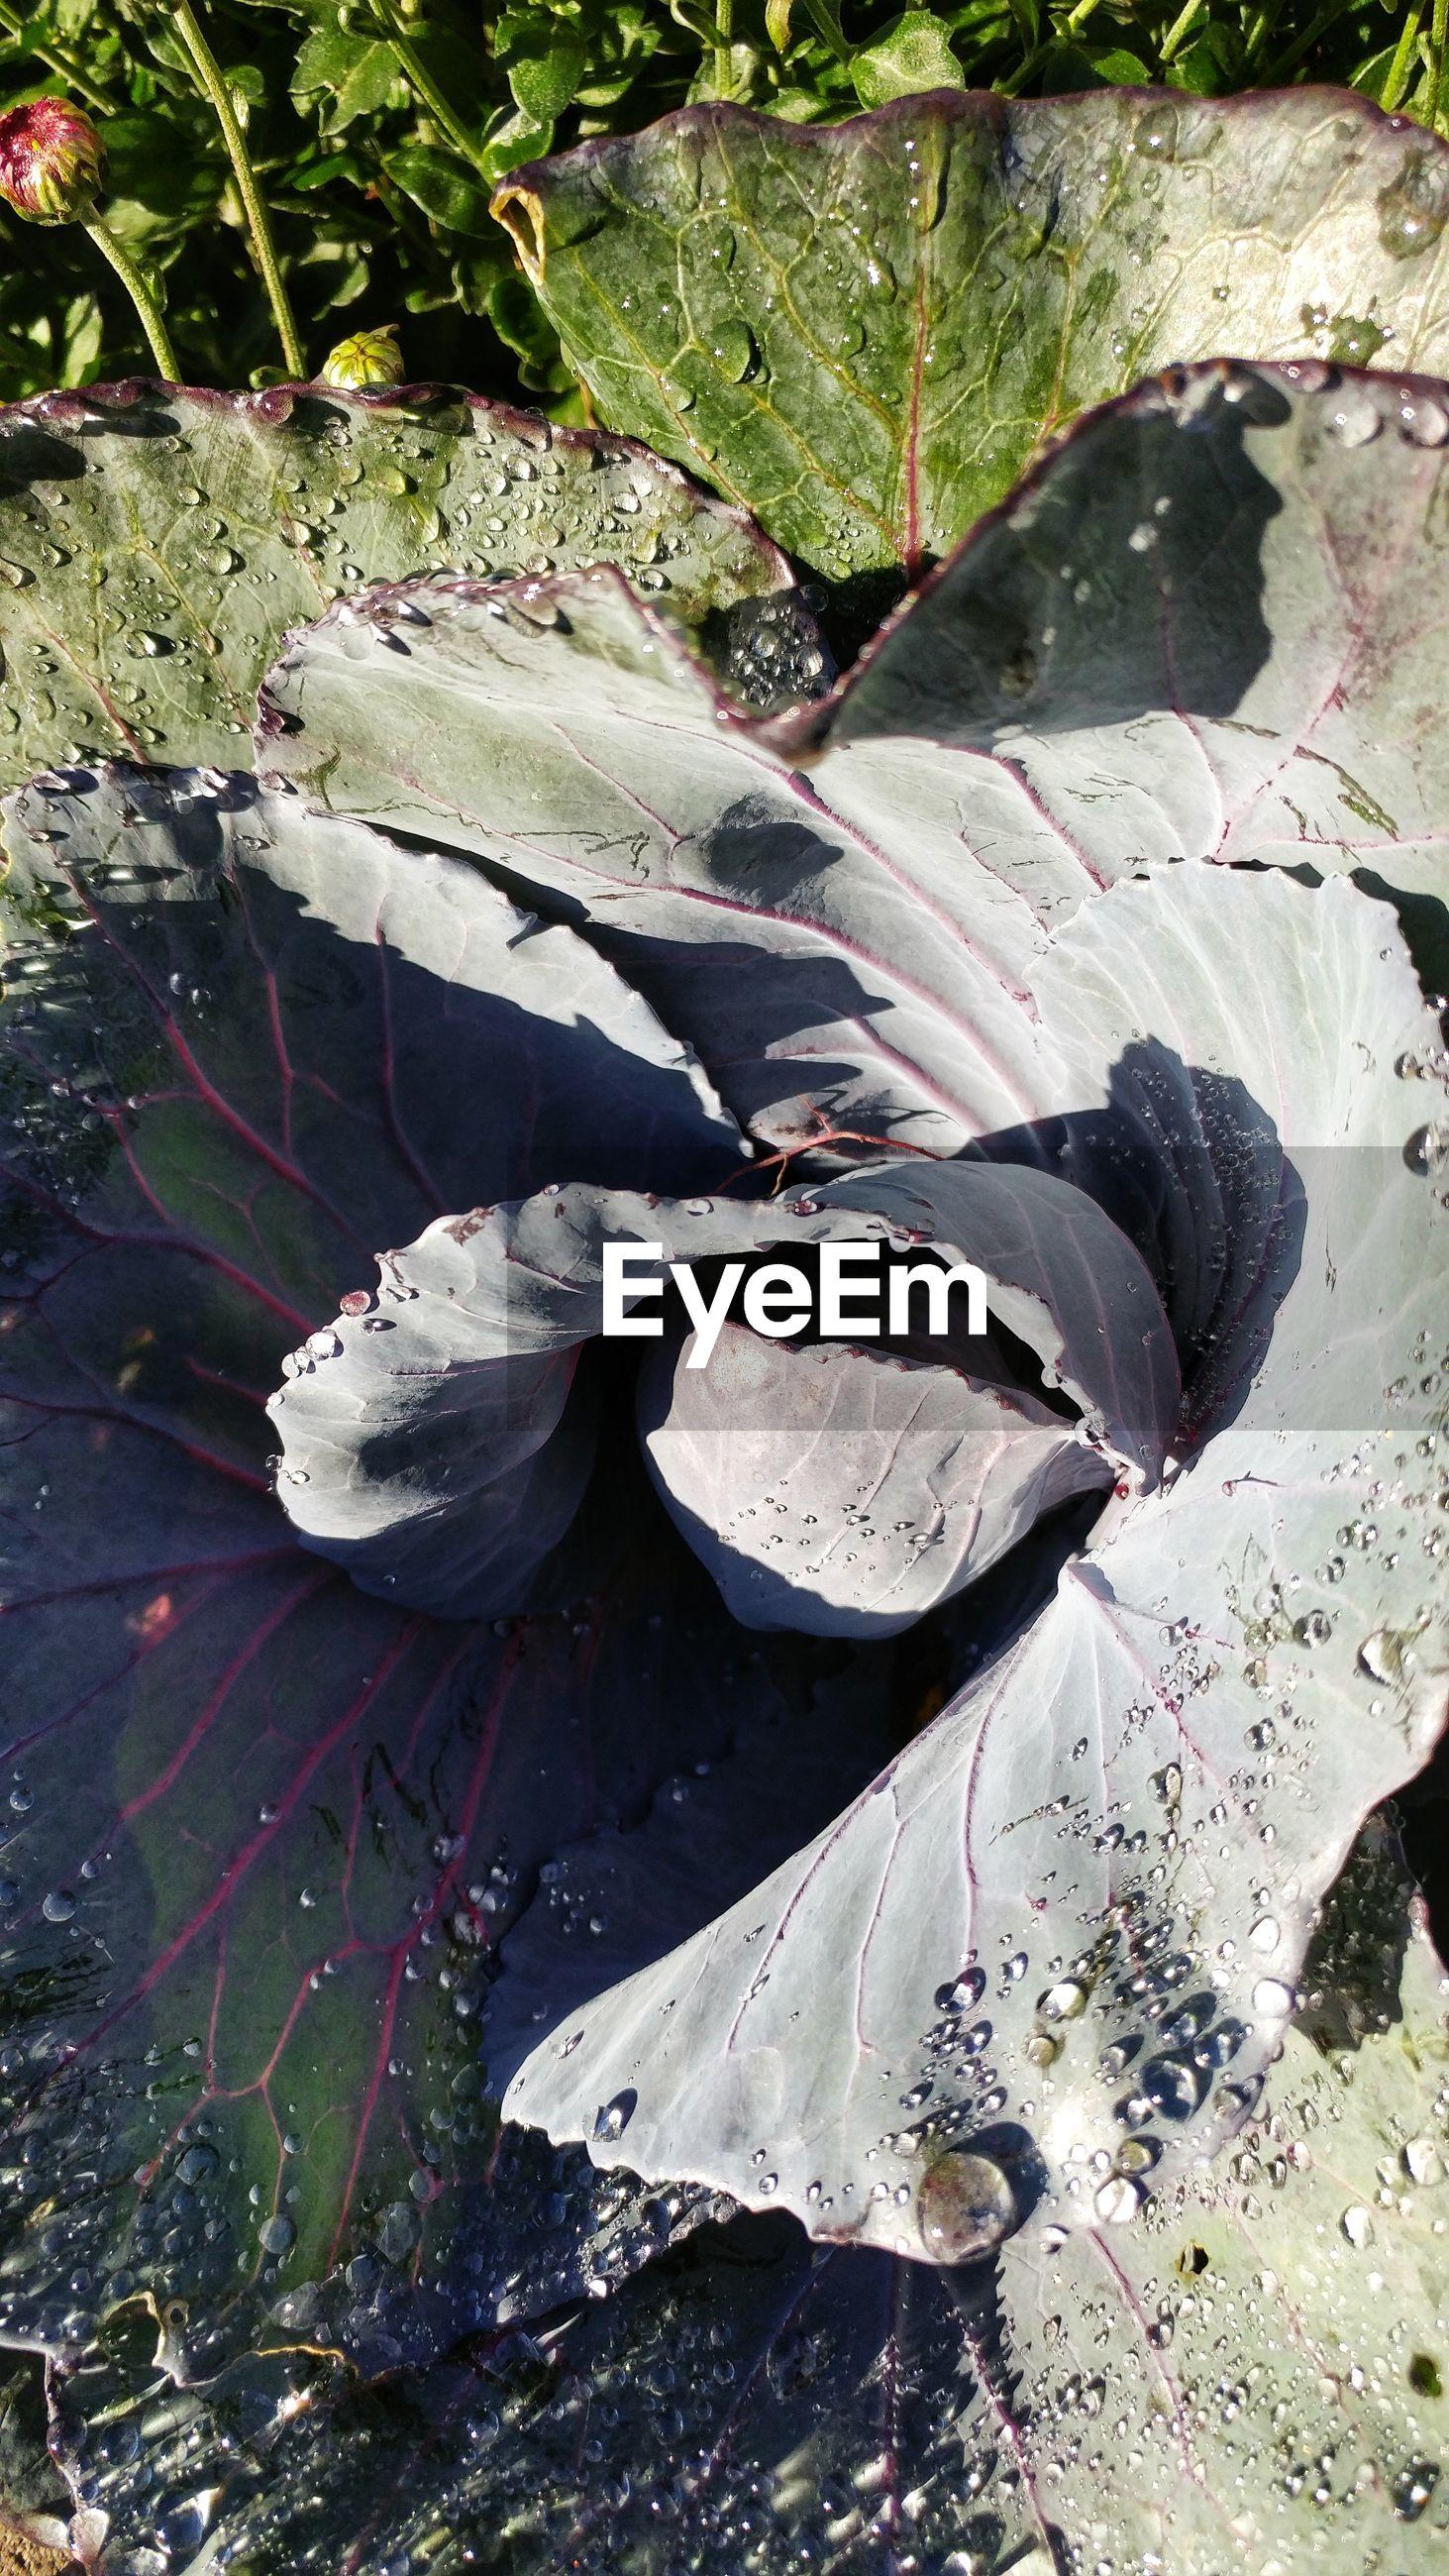 HIGH ANGLE VIEW OF CRAB ON PLANTS